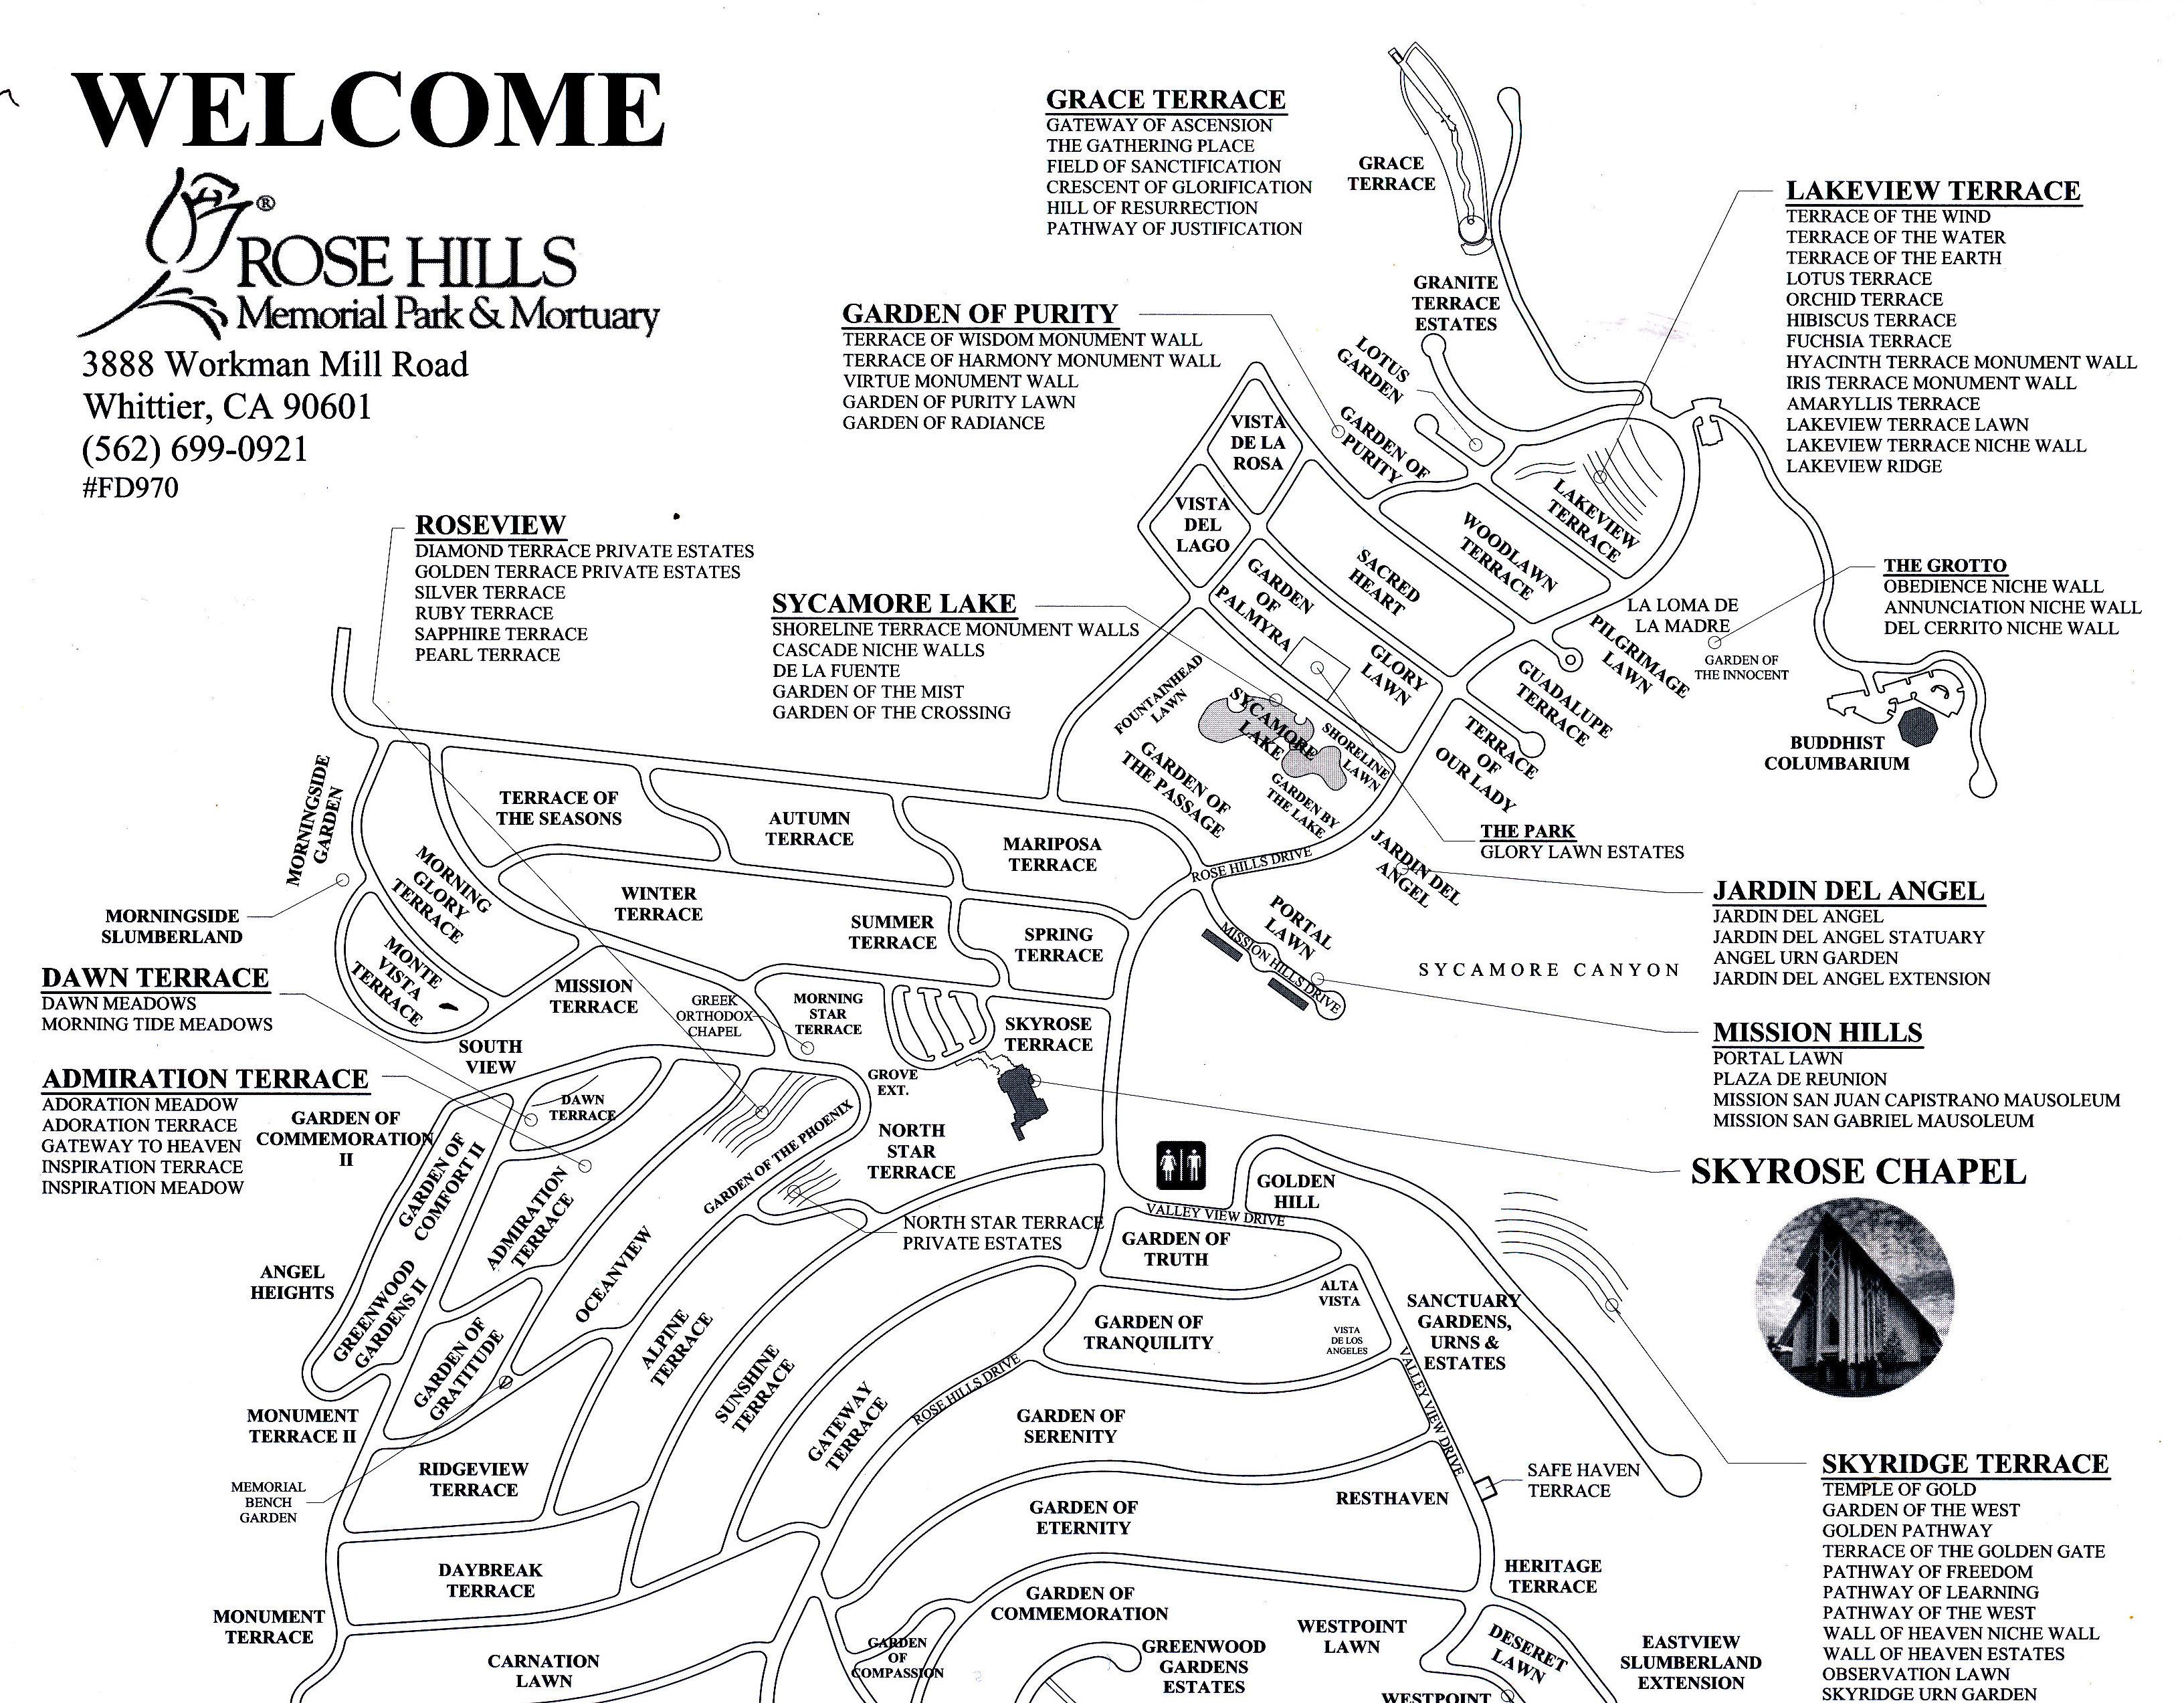 Rose Hills Map Exodoinvest